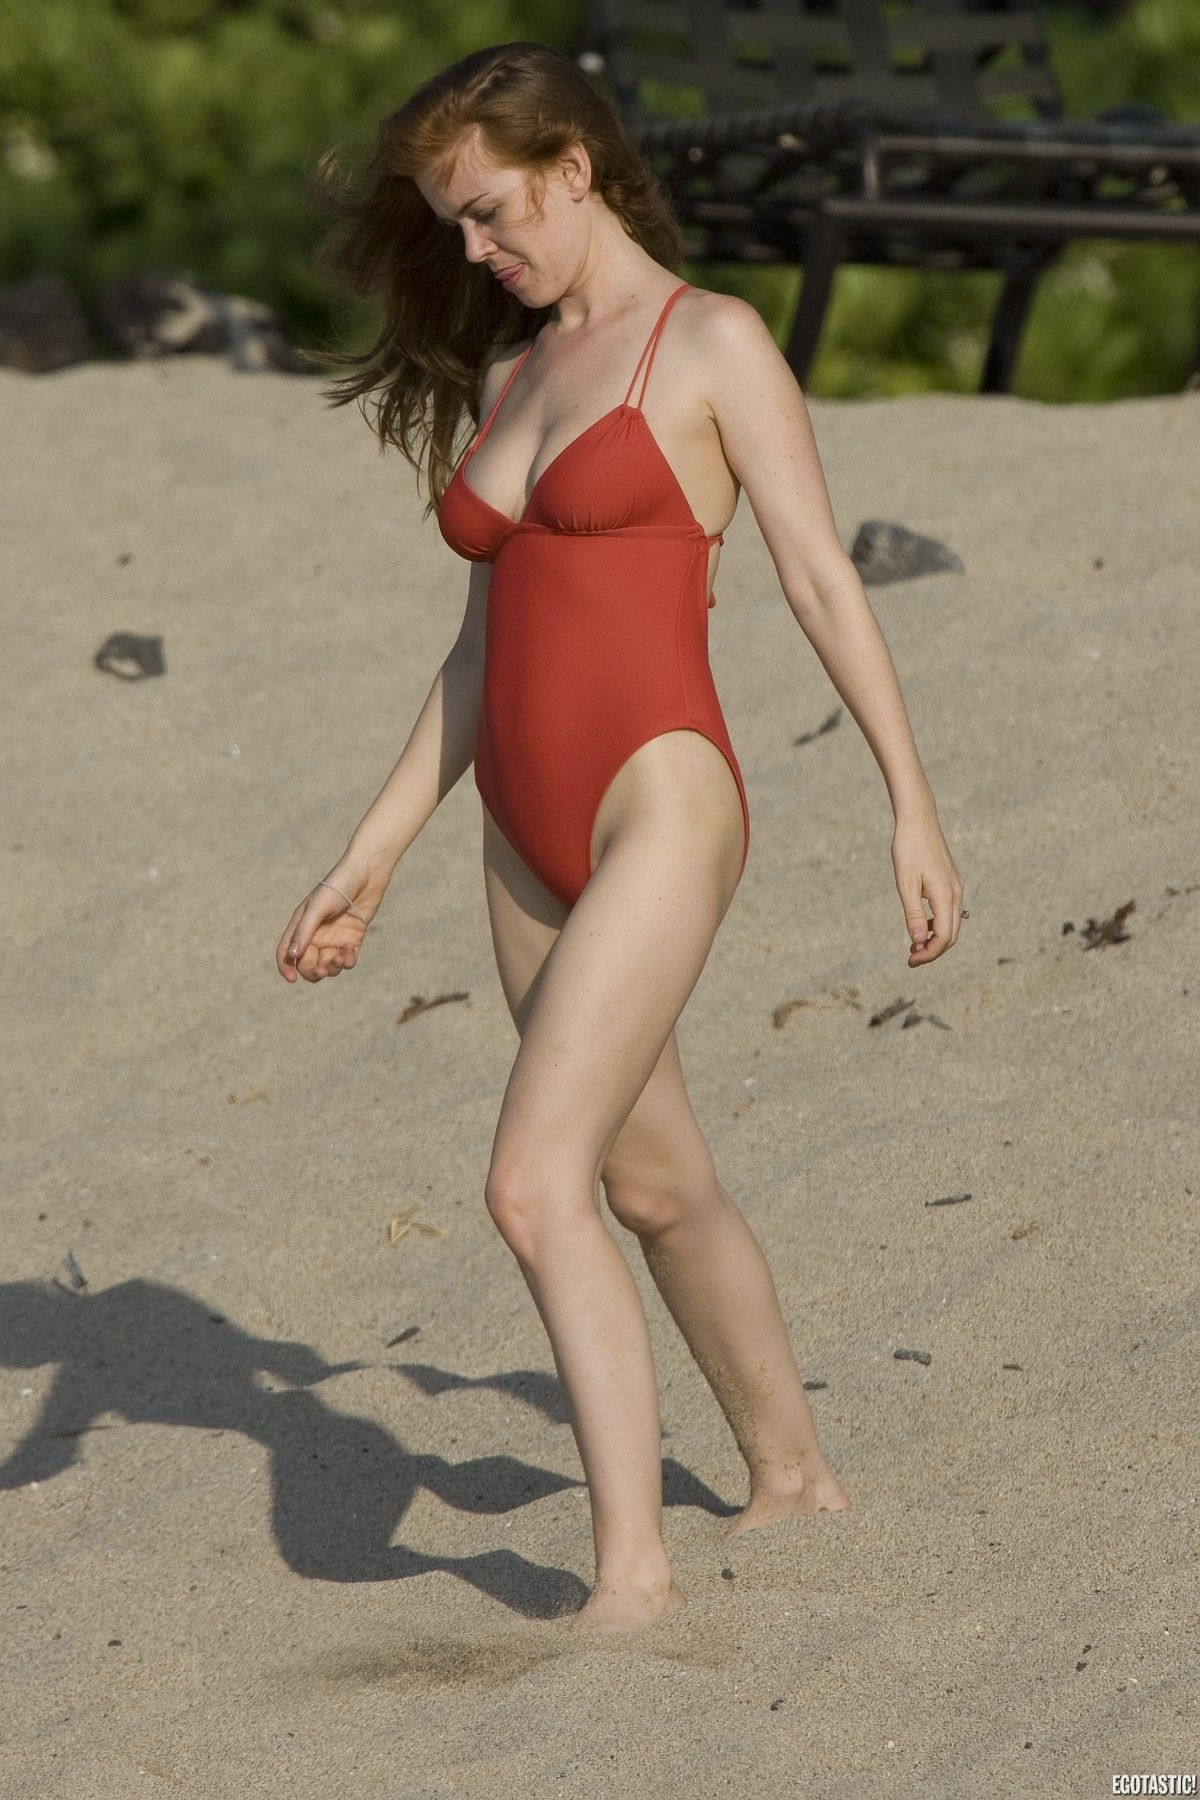 Bikini Isla Fisher nude (72 photos), Sexy, Fappening, Boobs, cameltoe 2015